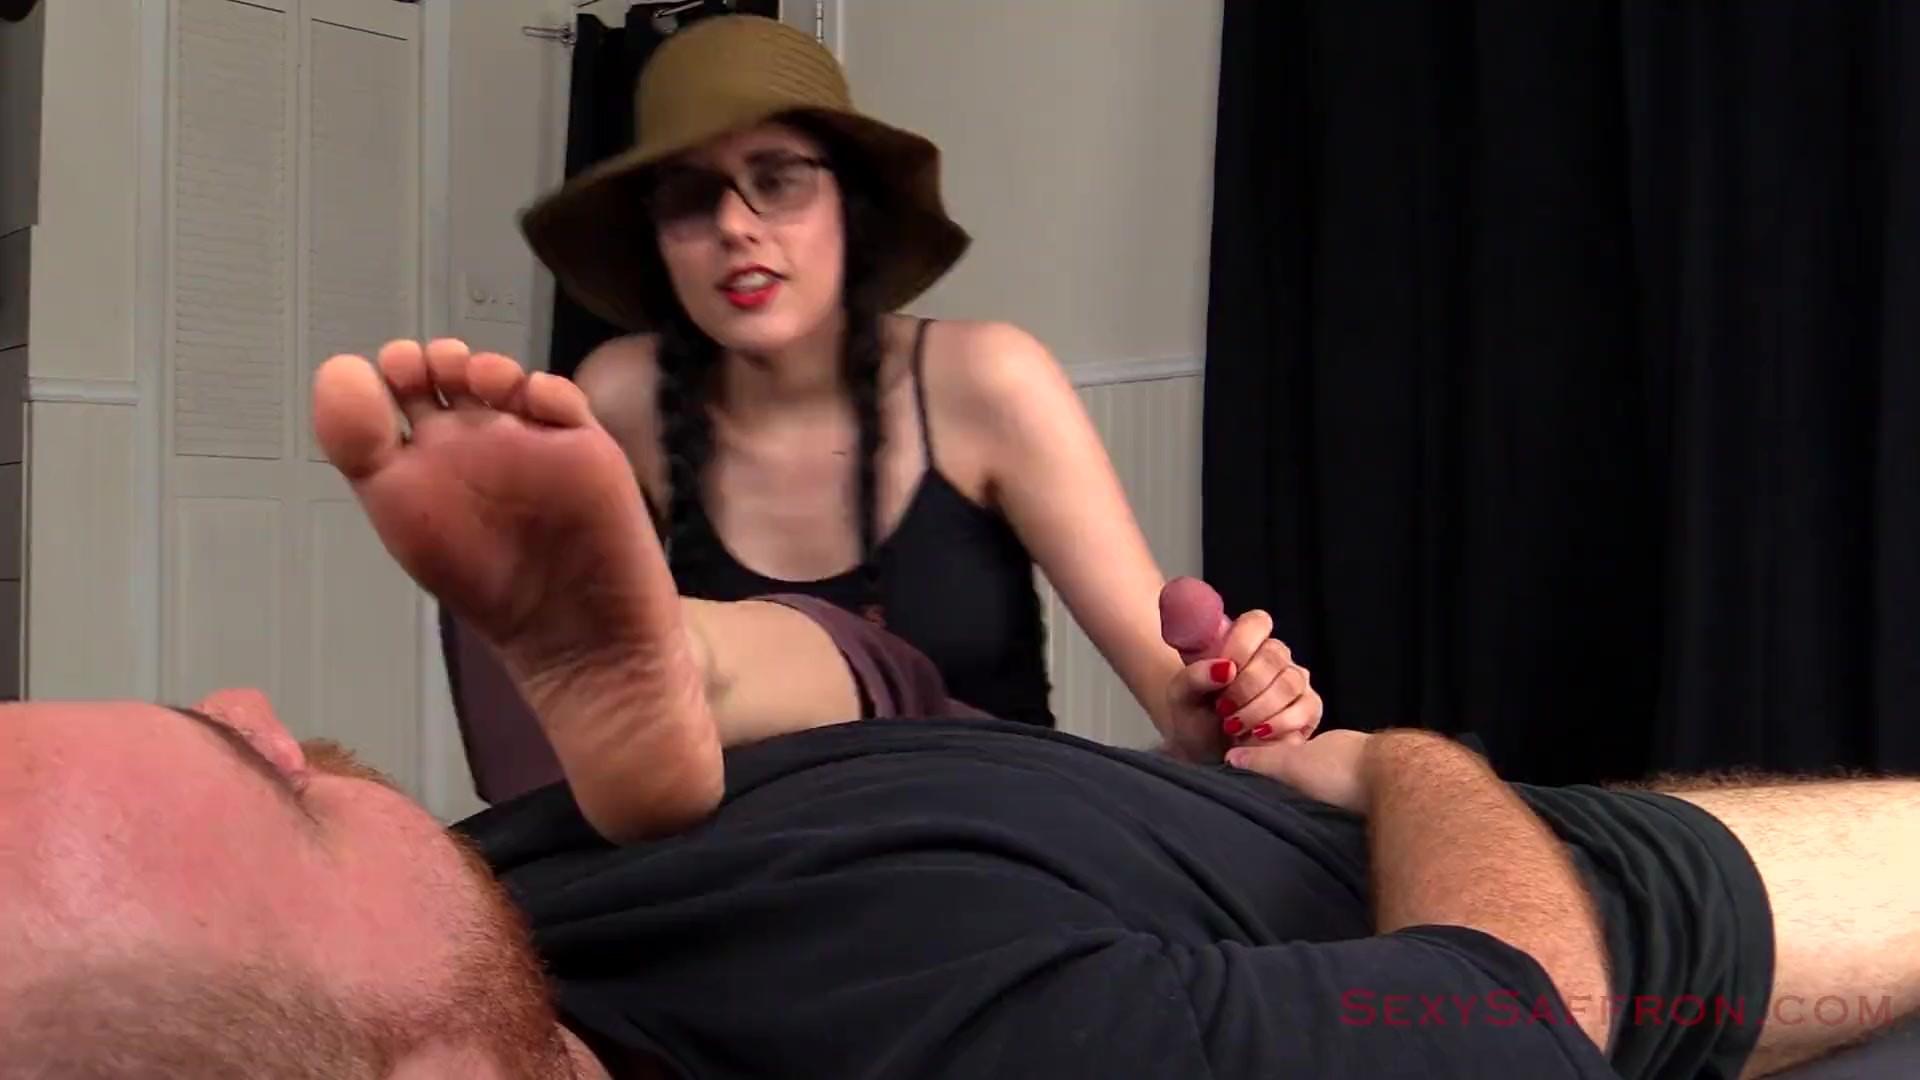 Foot Smelling Handjob And Blowjob After Dancing